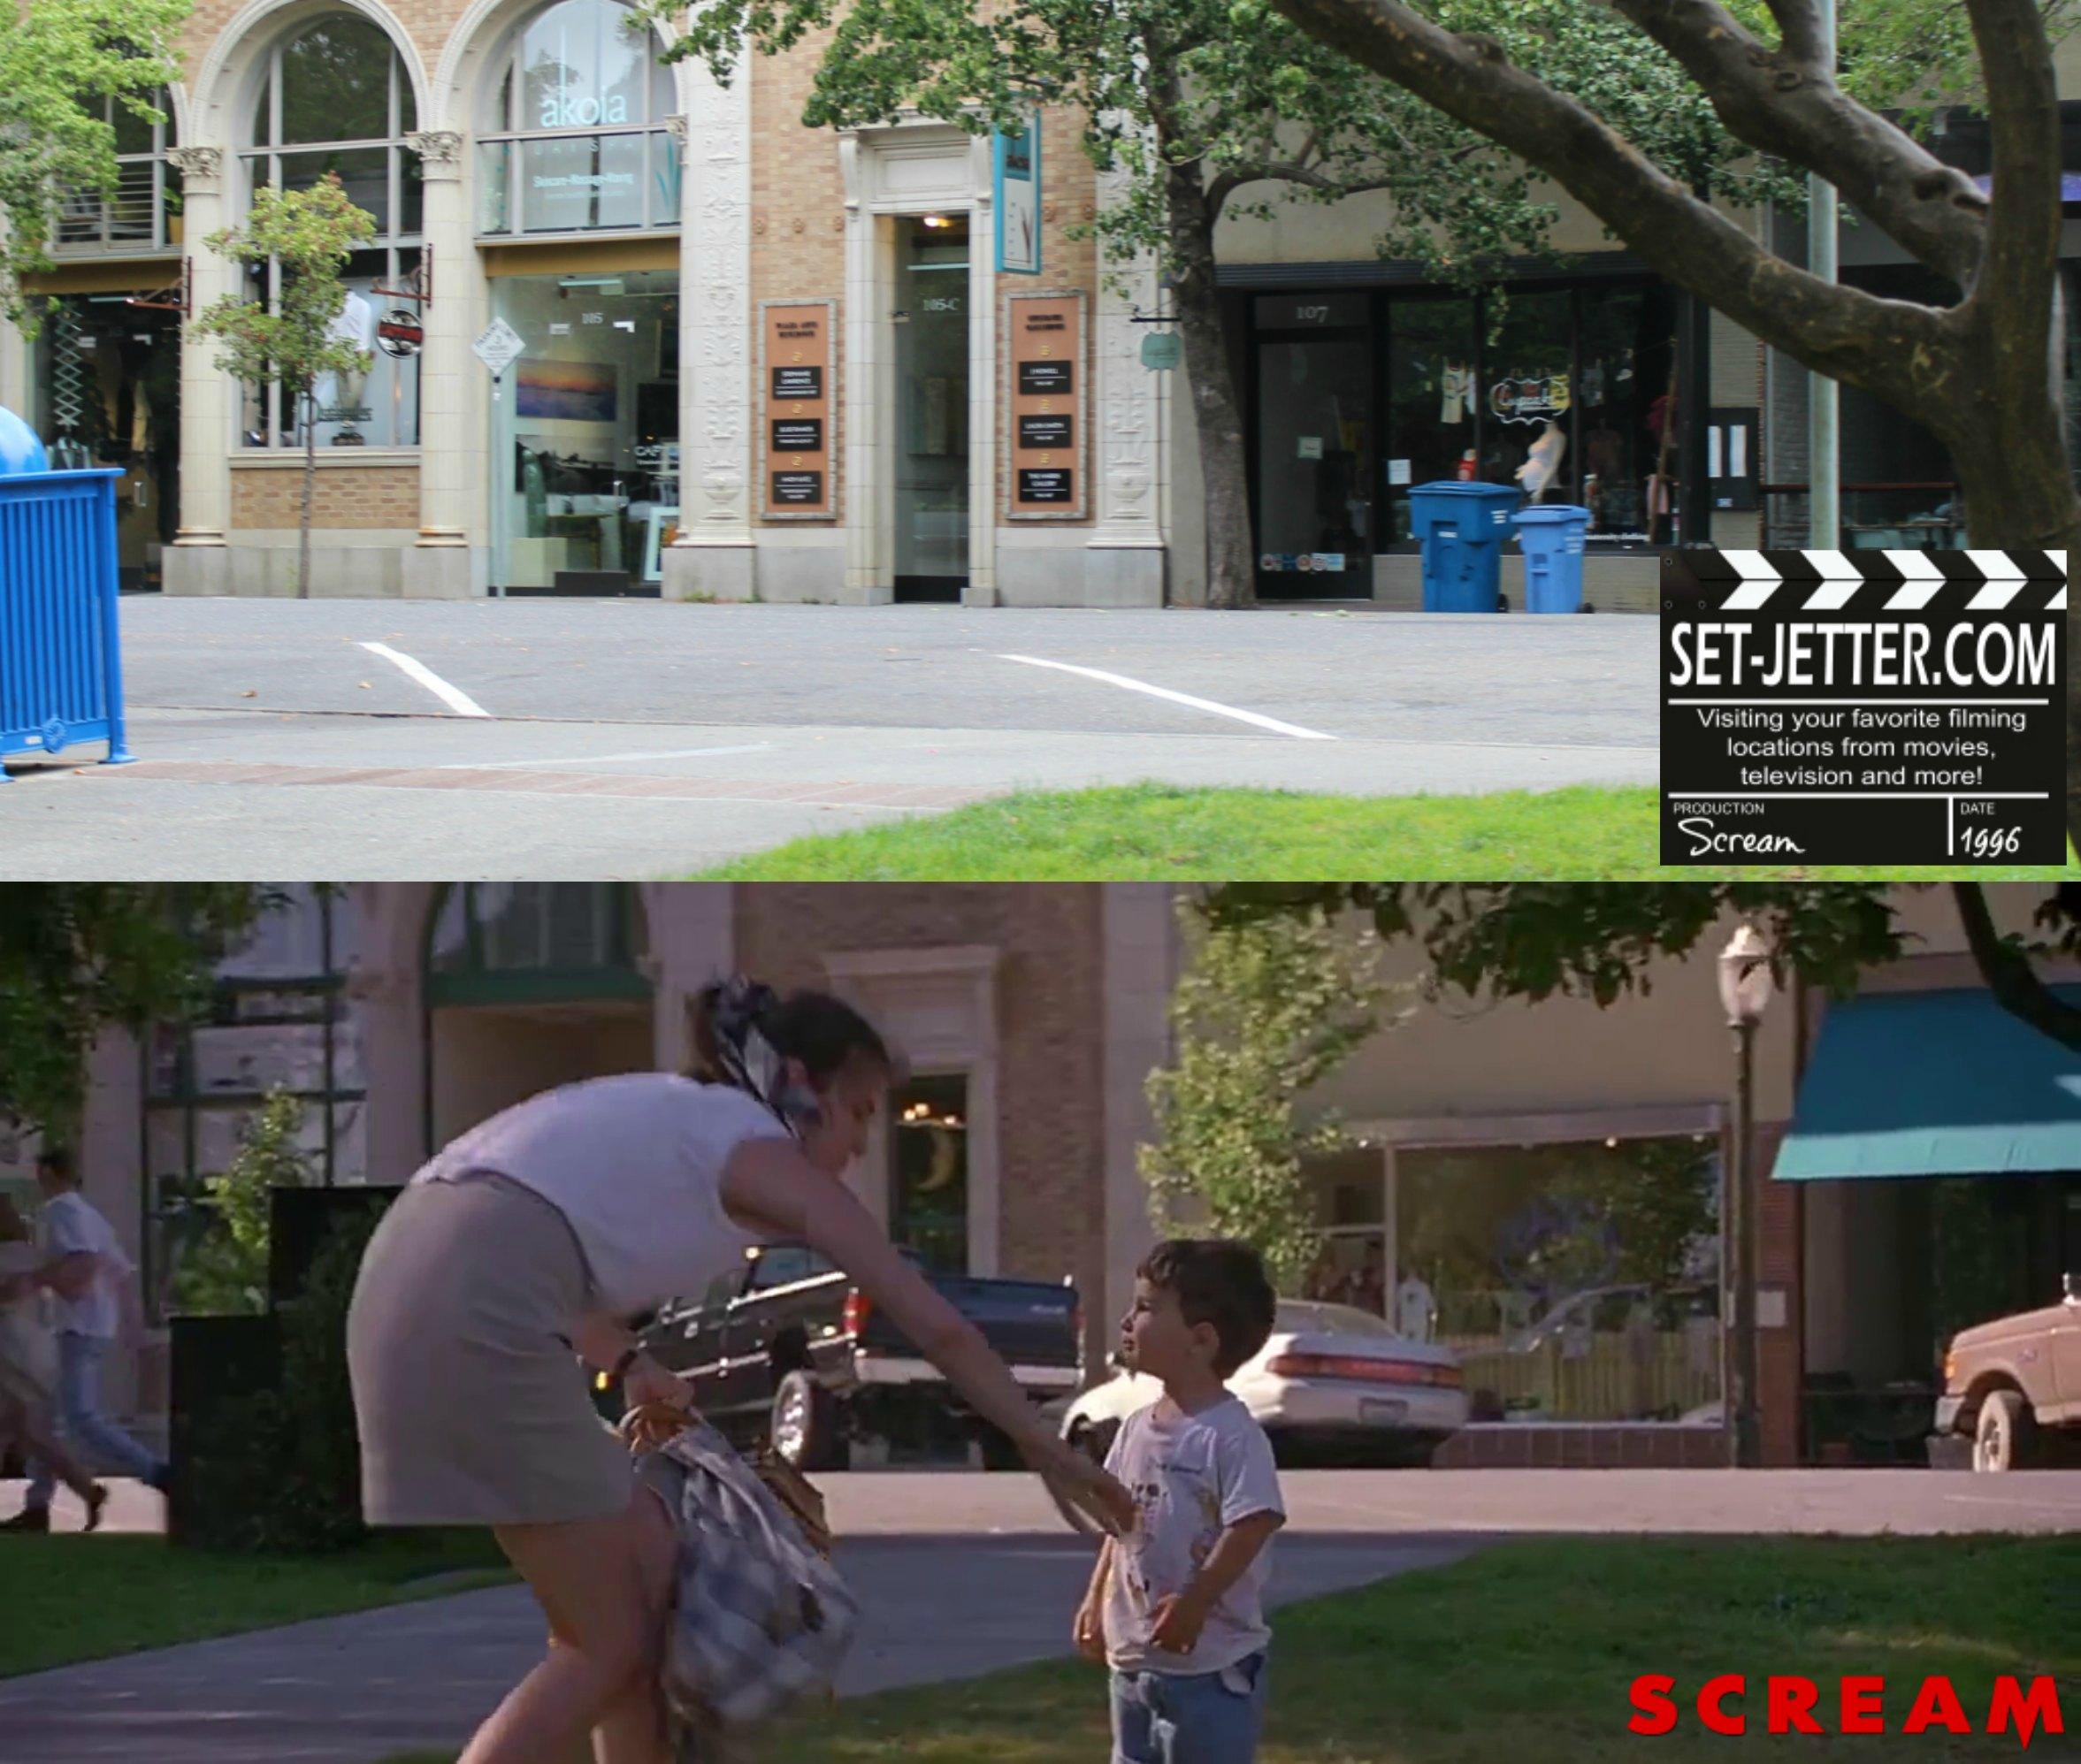 Scream comparison 184.jpg